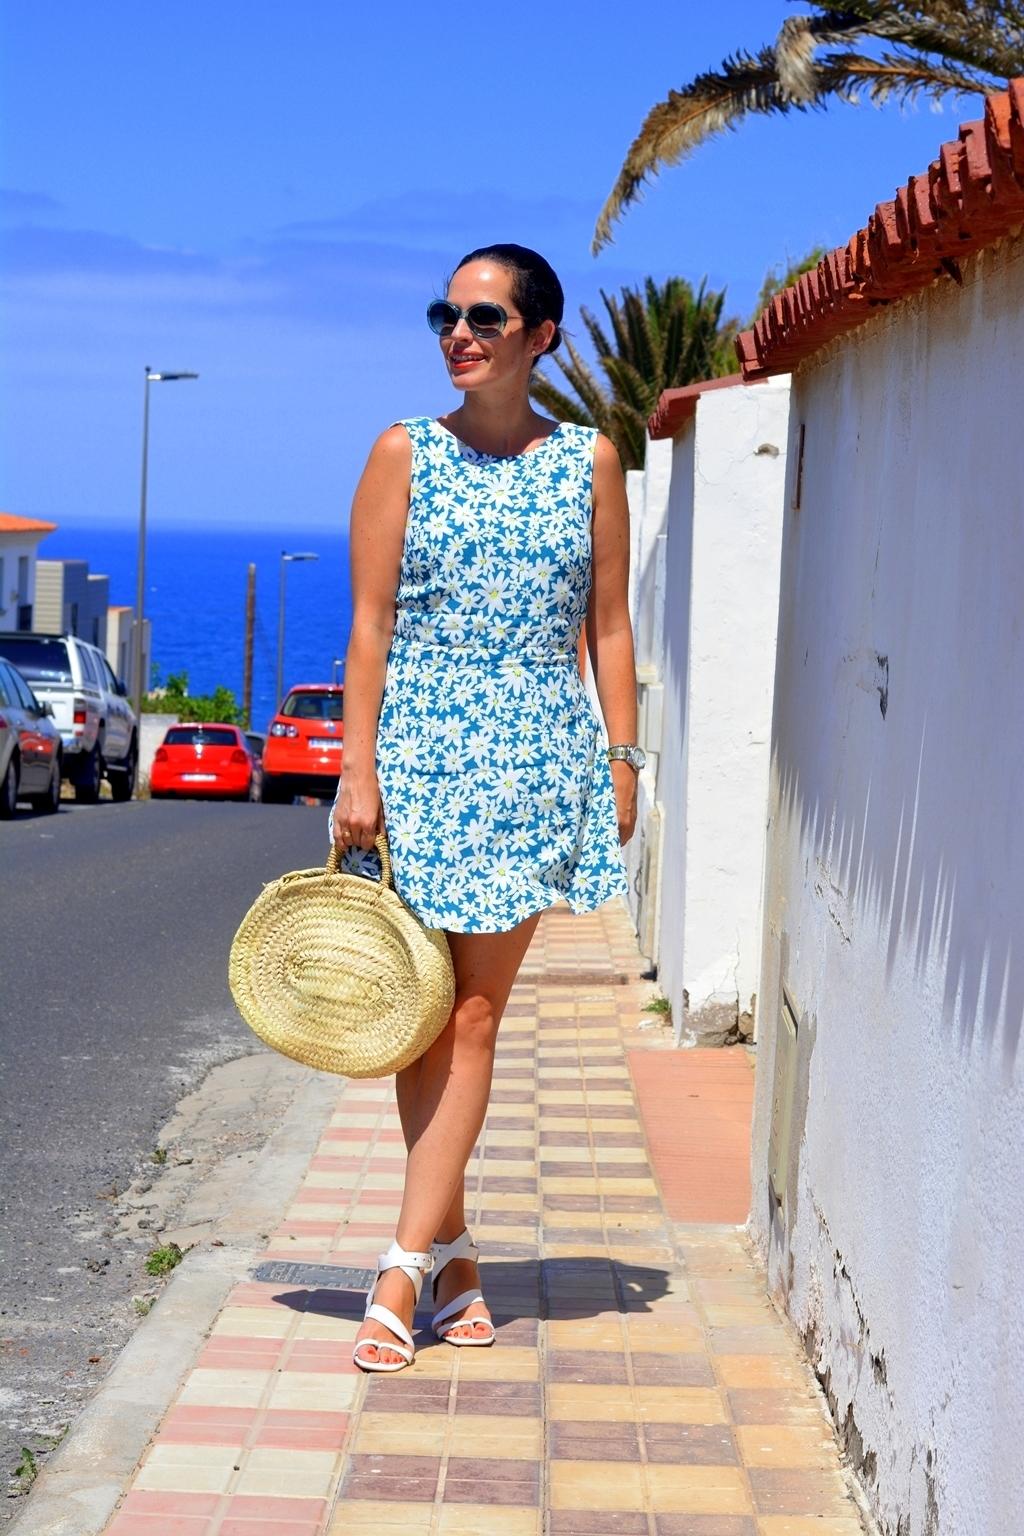 zara-daisy-print-outfit-streetstyle-daily-looks